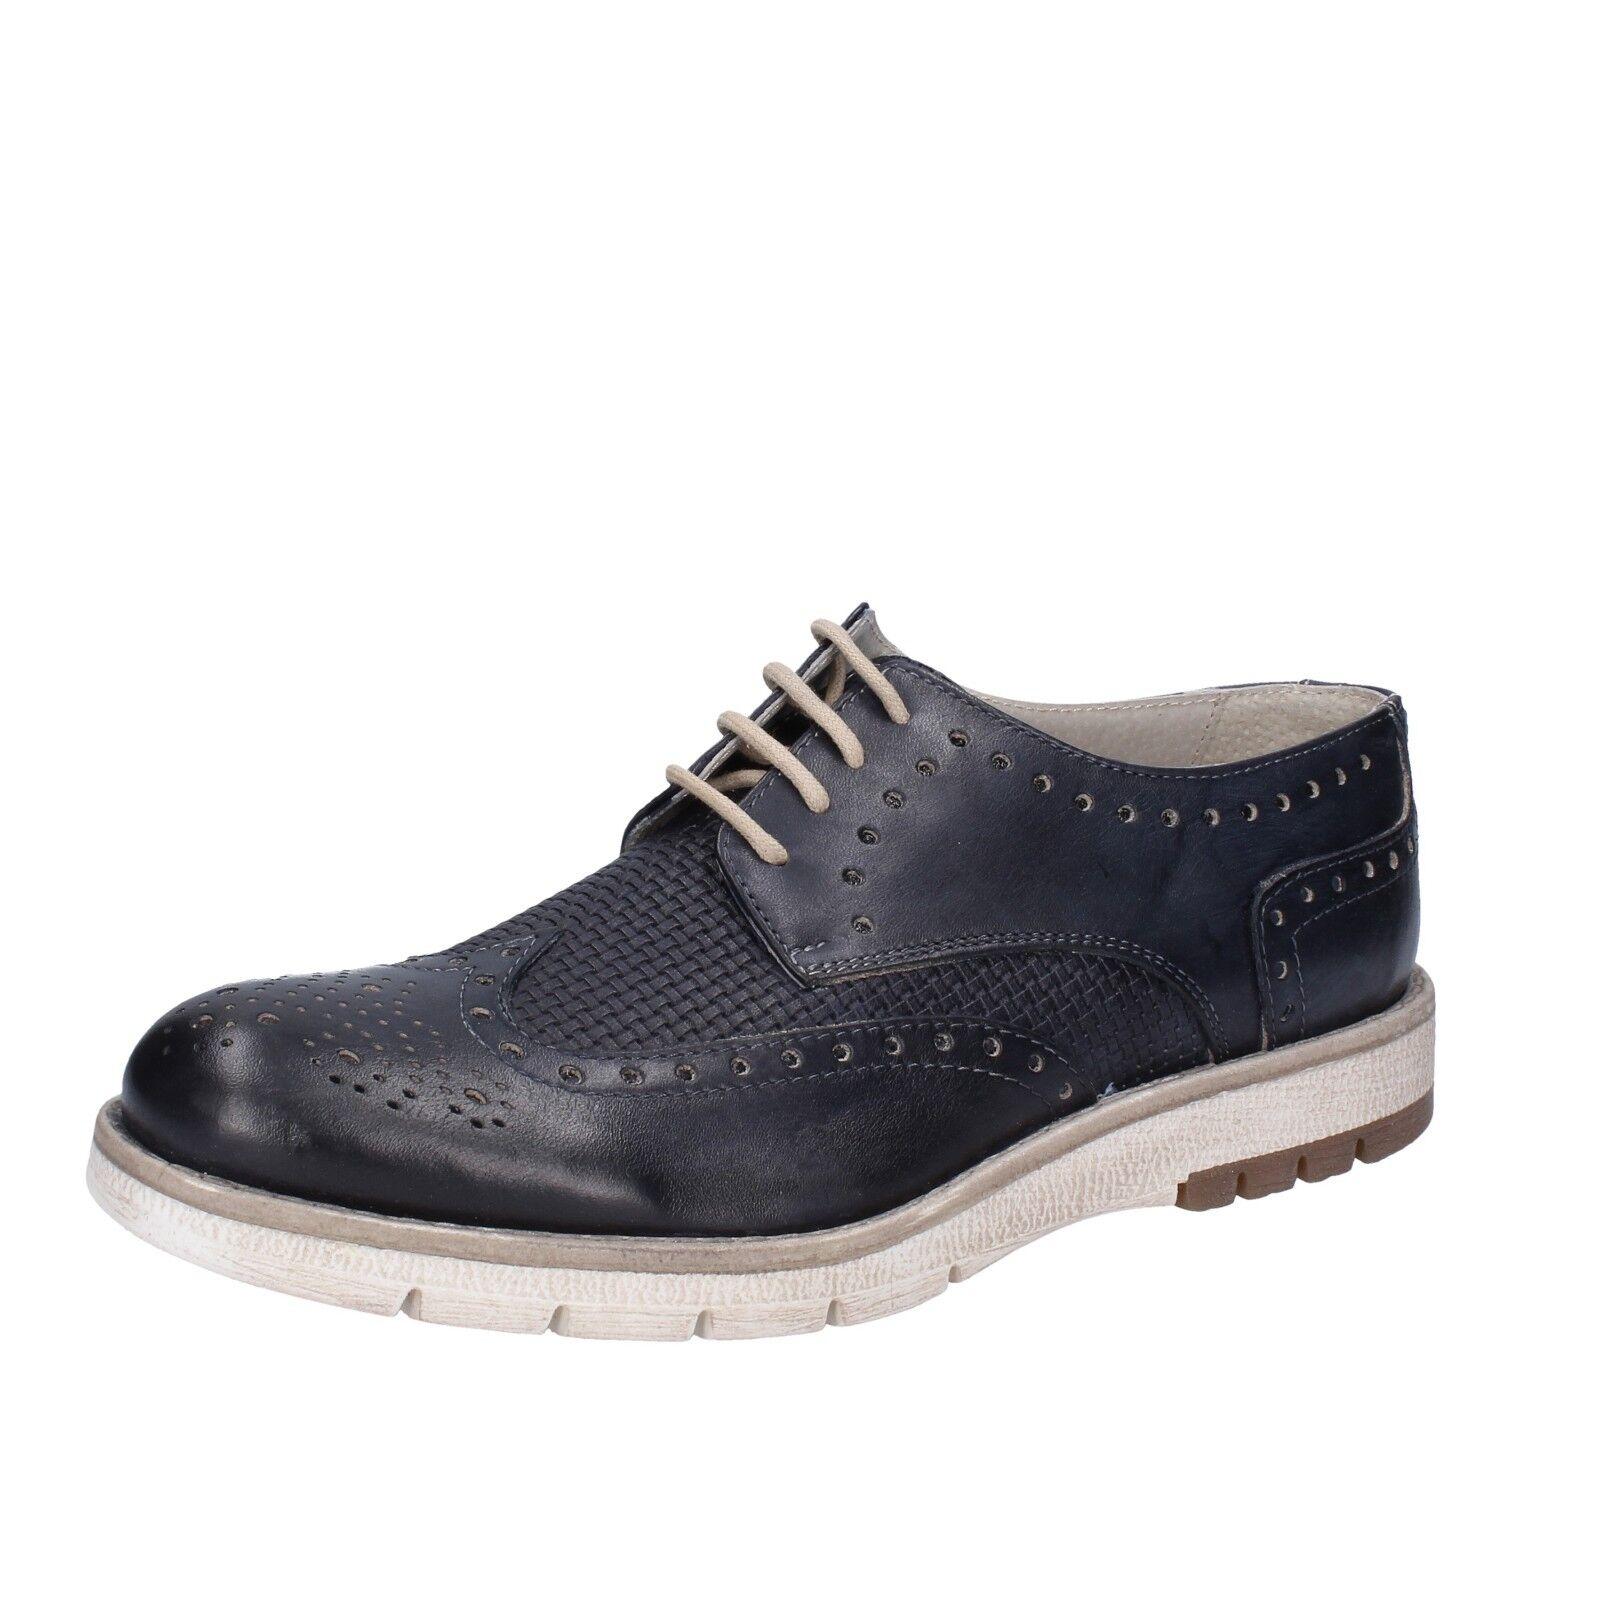 Mens schuhe OSSIANI 6 (EU 40) 40) 40) elegant Blau leather BT868-40 d2897b